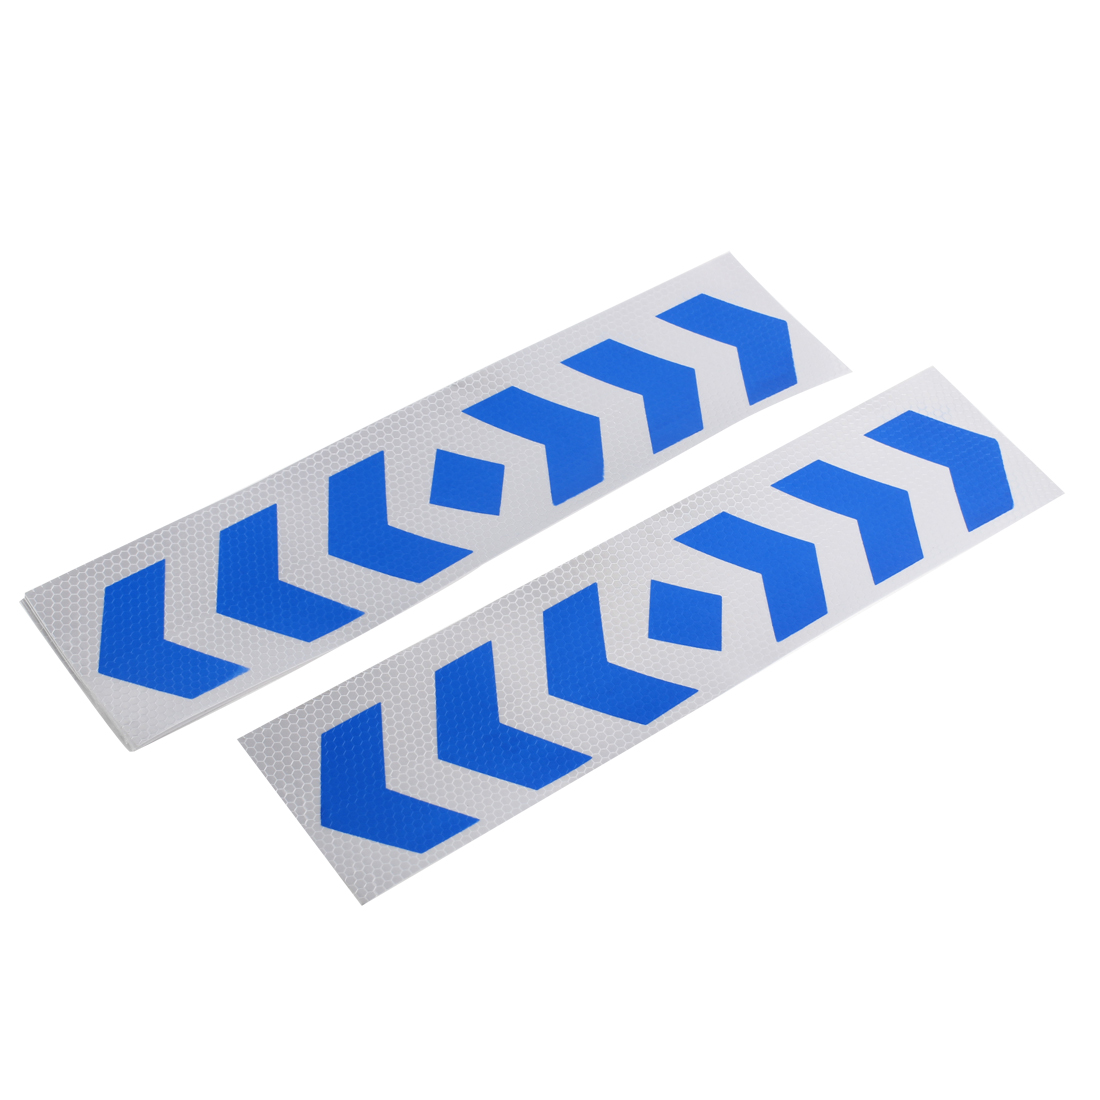 10 Pcs Blue Slive Tone Plastic Reflective Sticker Decal 40 x 10cm for Car